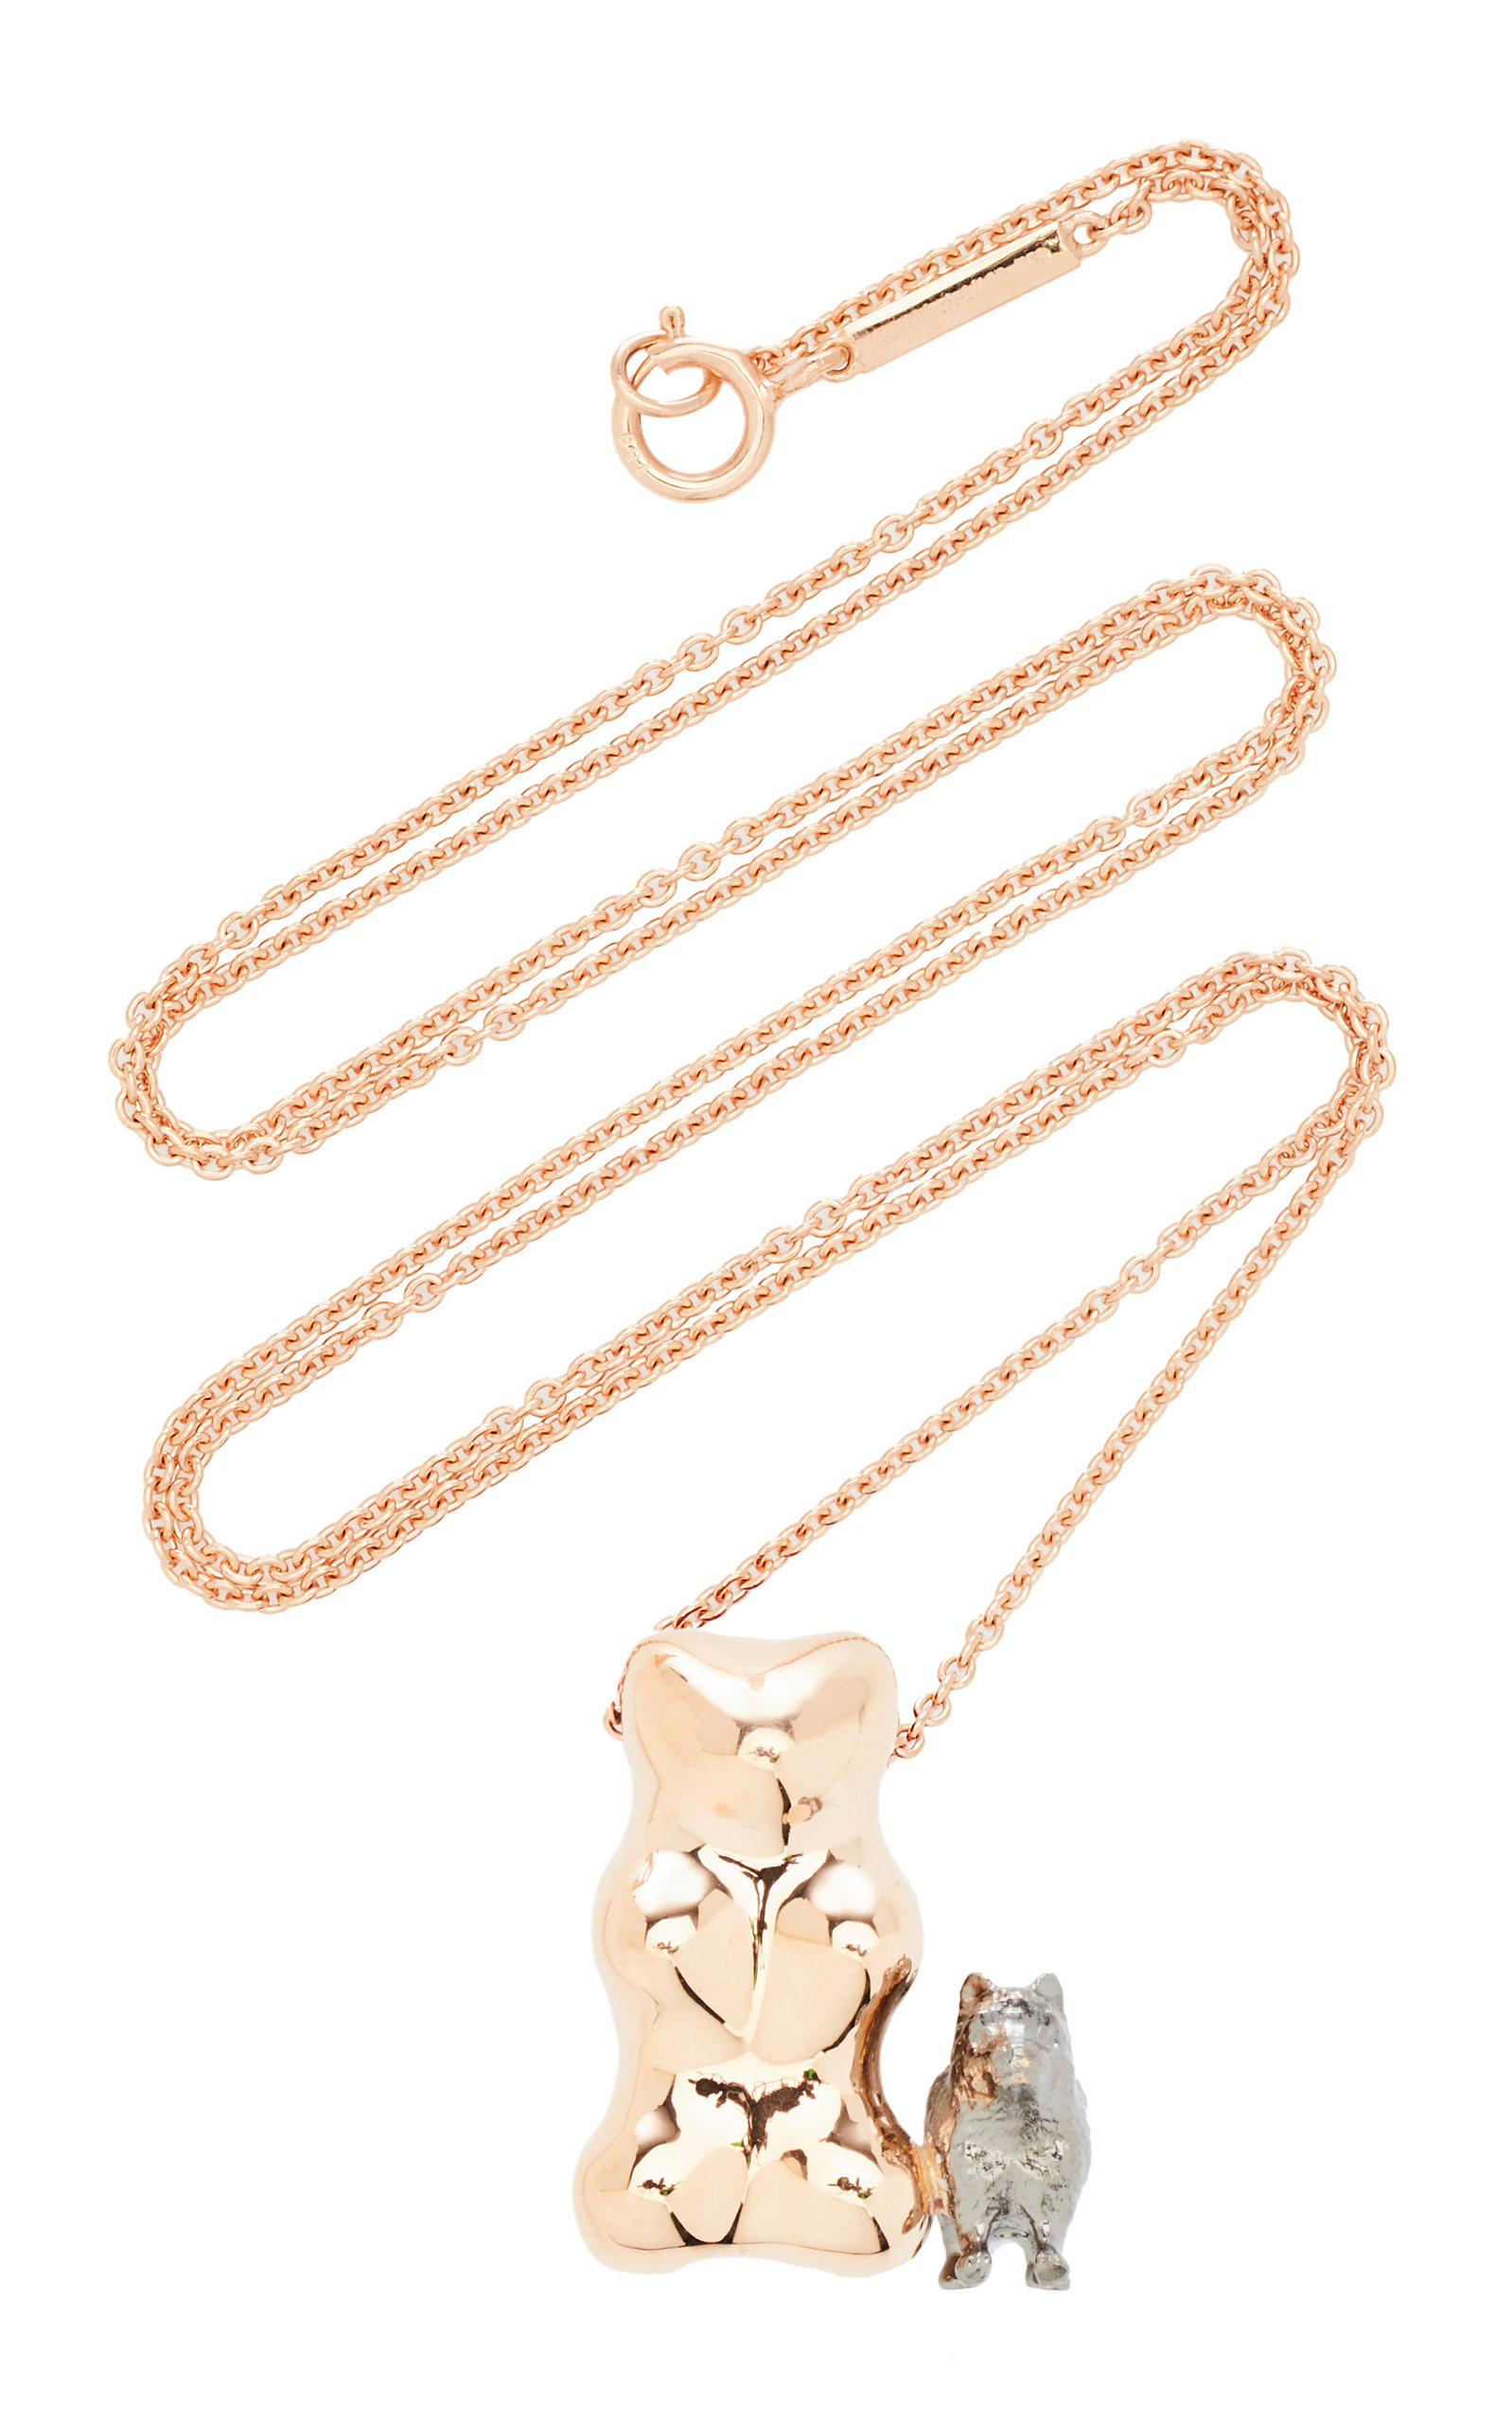 Lauren X Khoo - Women's Gummy Bear Dog 18K Rose and Yellow-Gold and Diamond Necklace - Gold - Moda Operandi